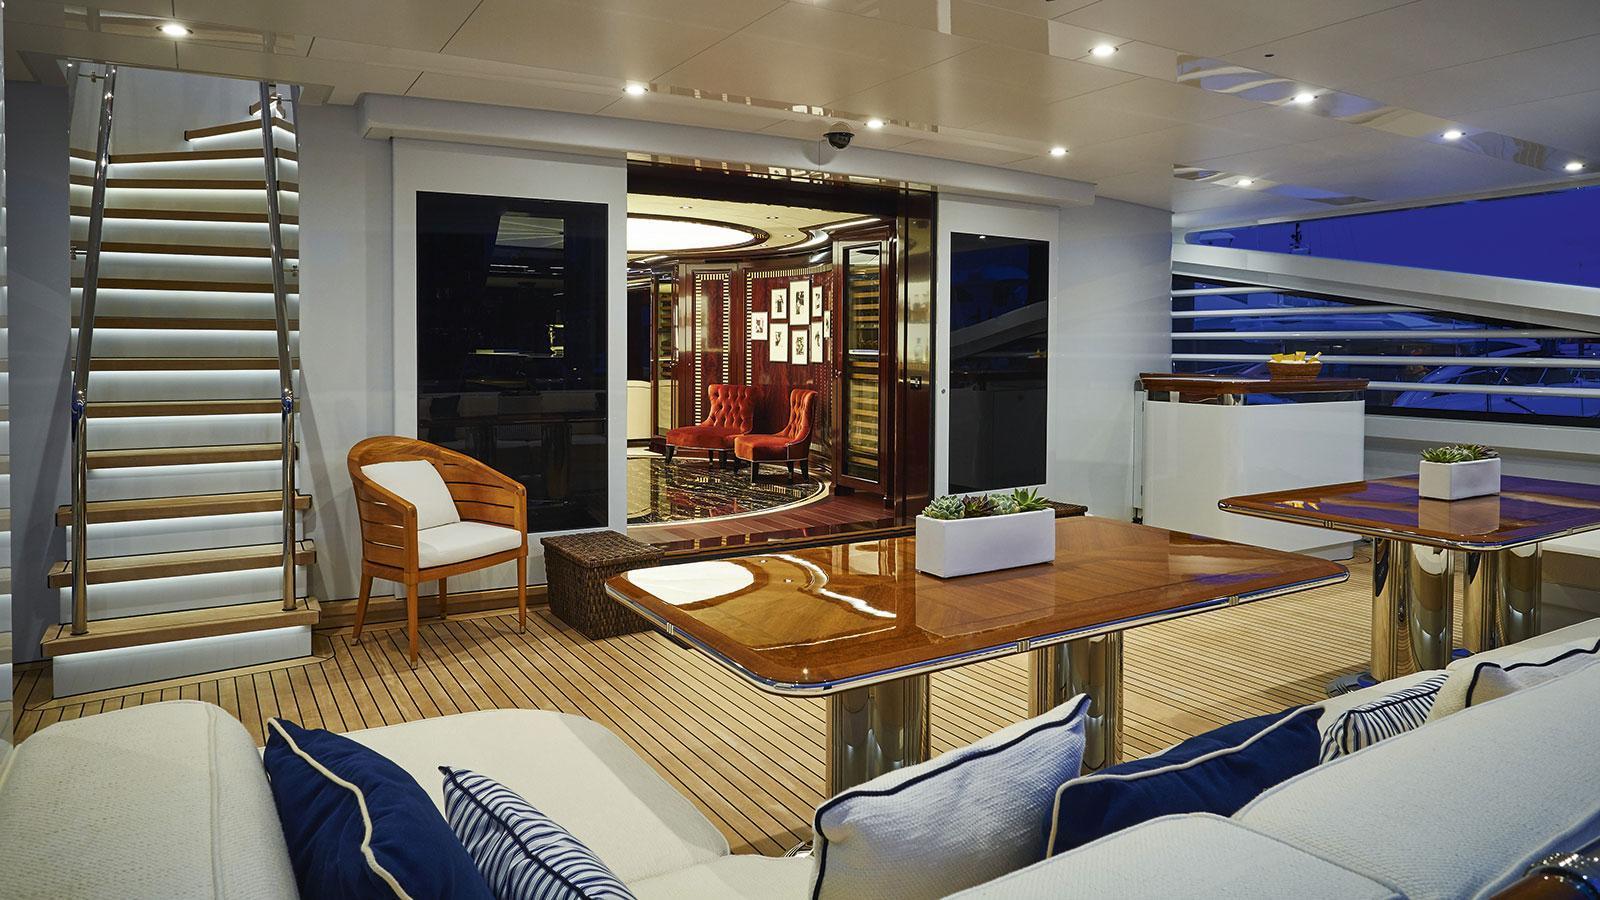 rock-it-motor-yacht-feadship-2014-60m-main-deck-aft